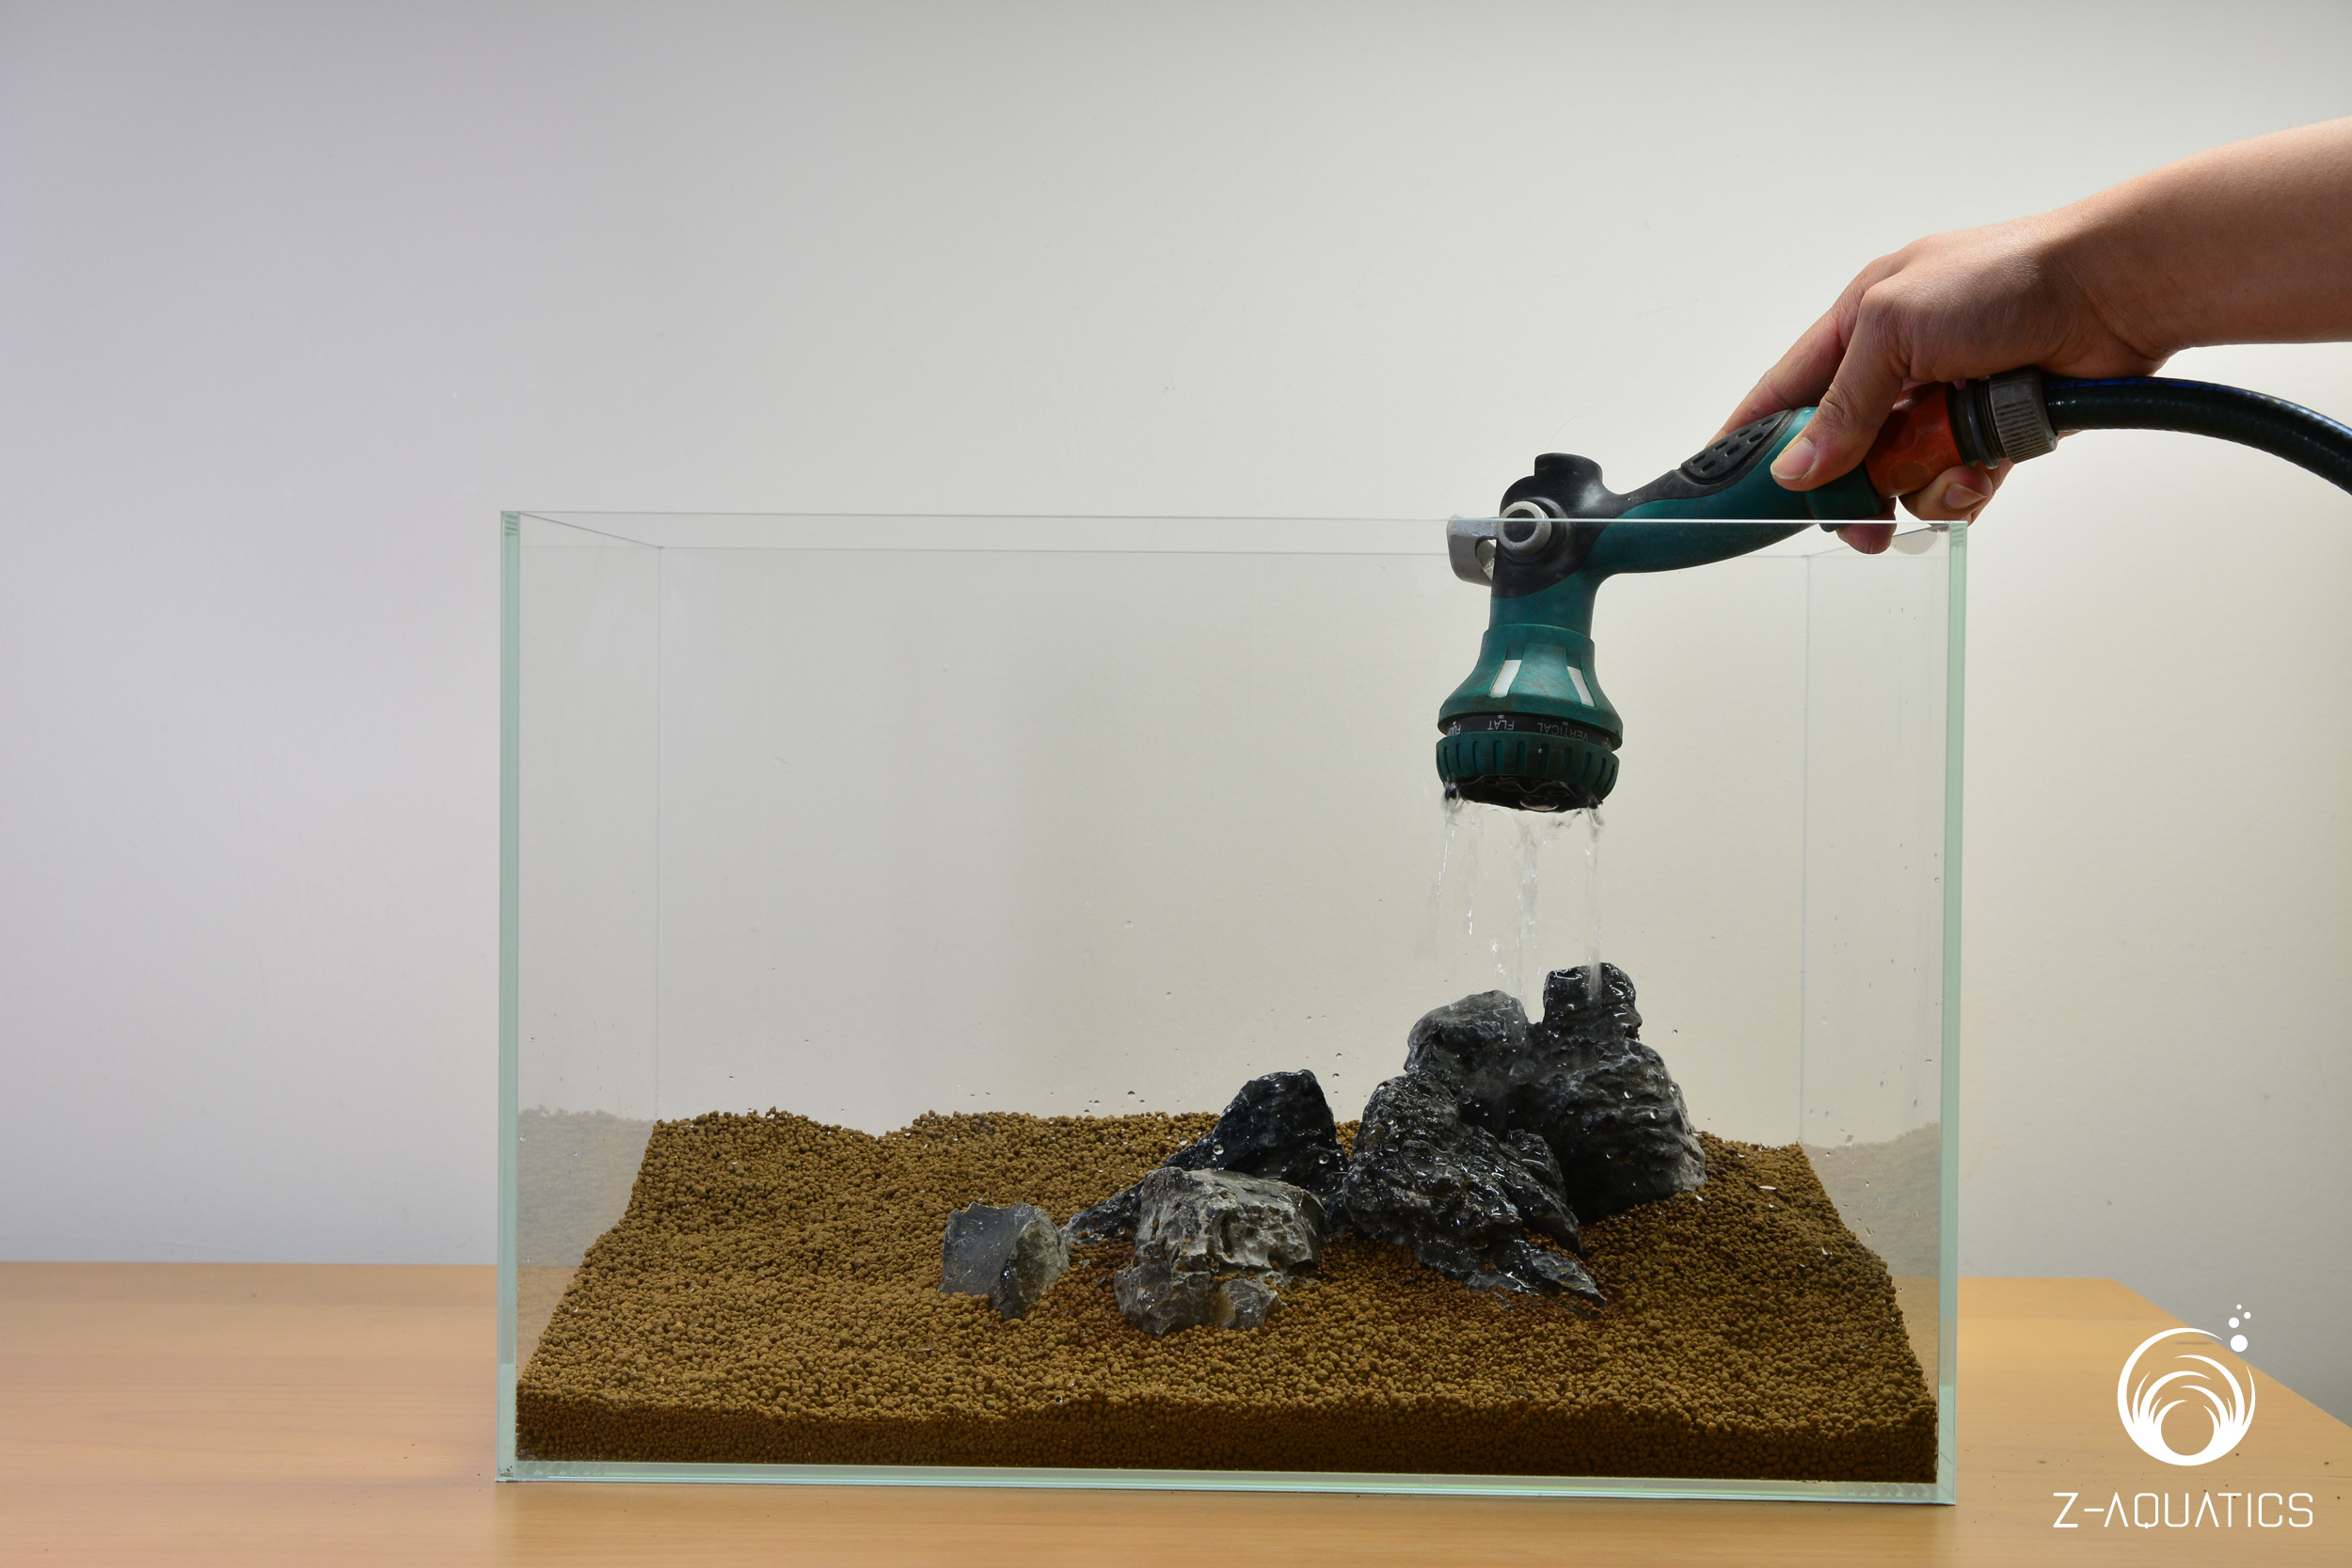 A guide for setting up a basic planted aquarium z aquatics for How to set up fish tank